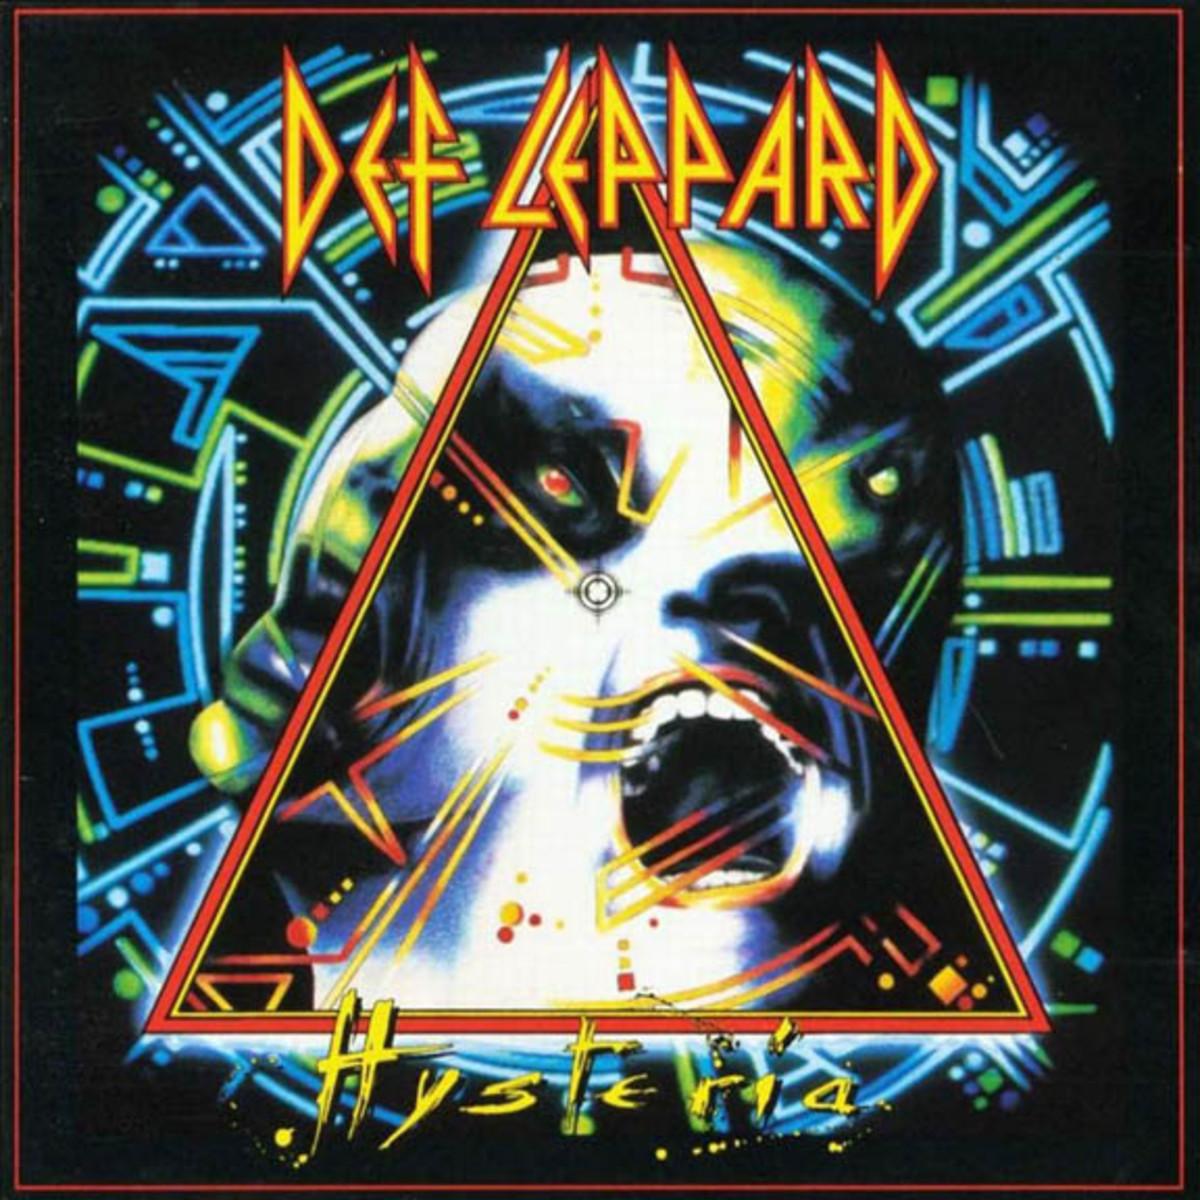 Def Leppard Hysterial album cover